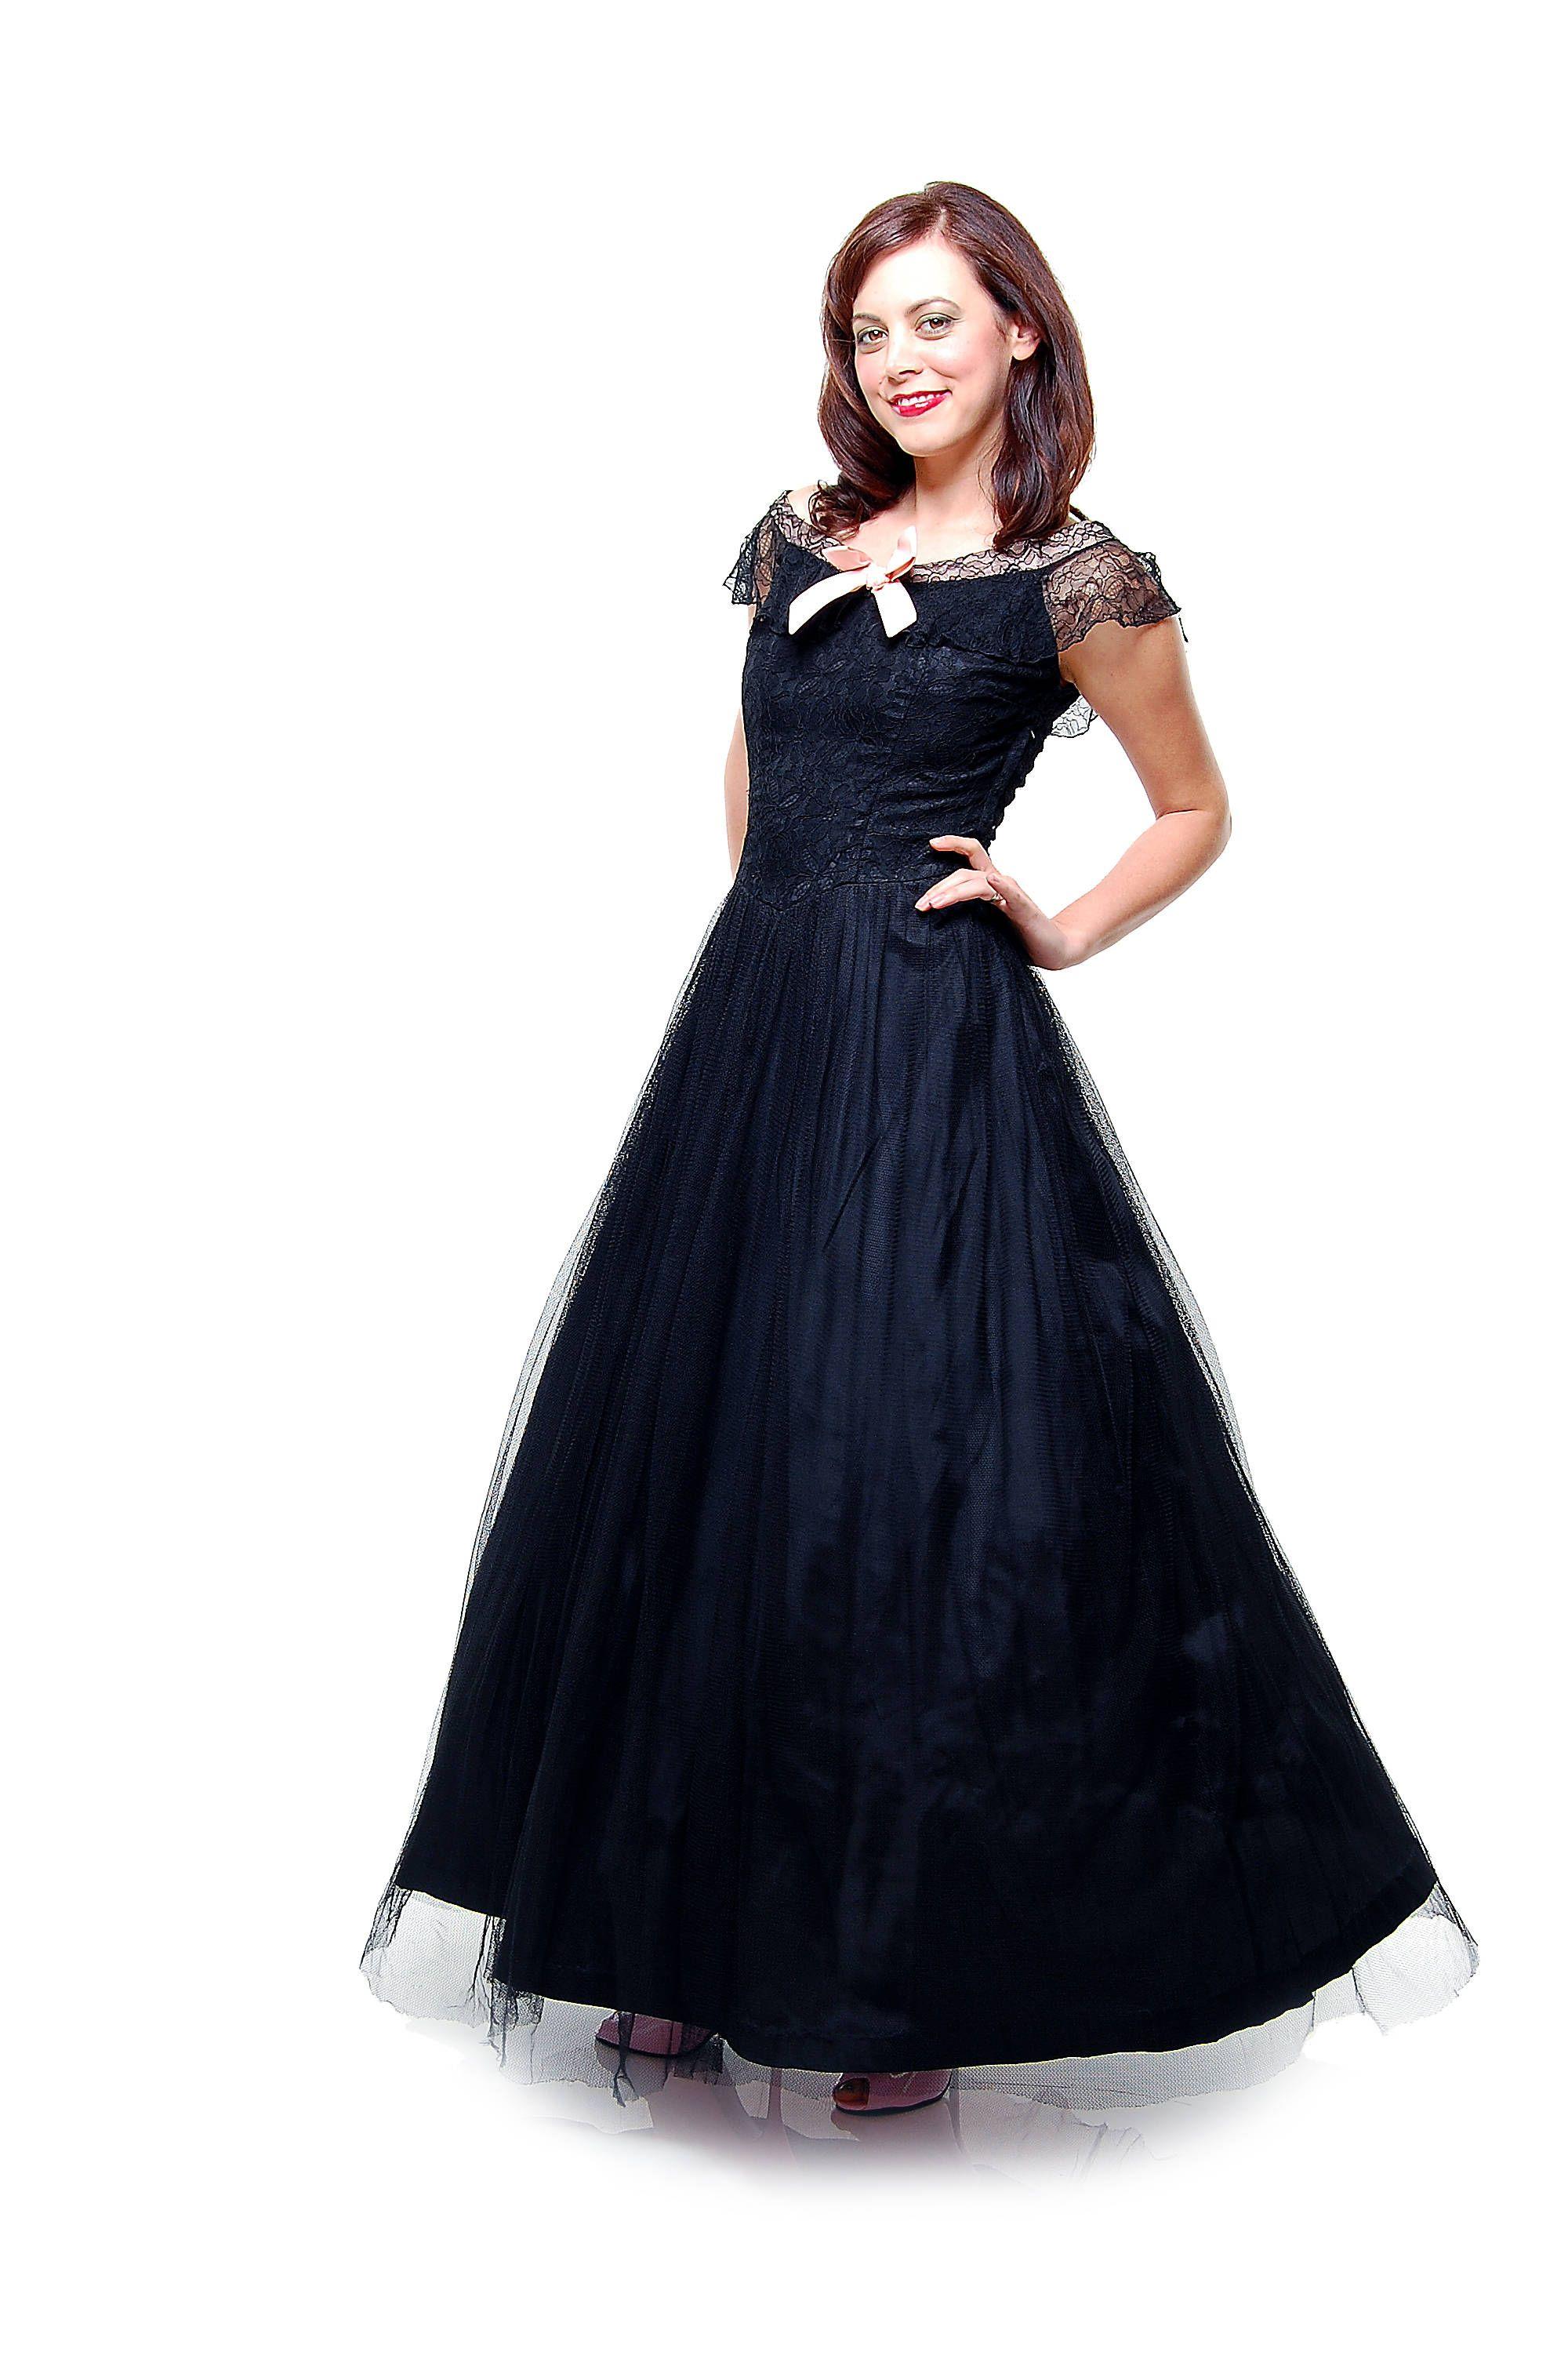 Vintage Retro Prom Dresses Cocktail Dresses 2016